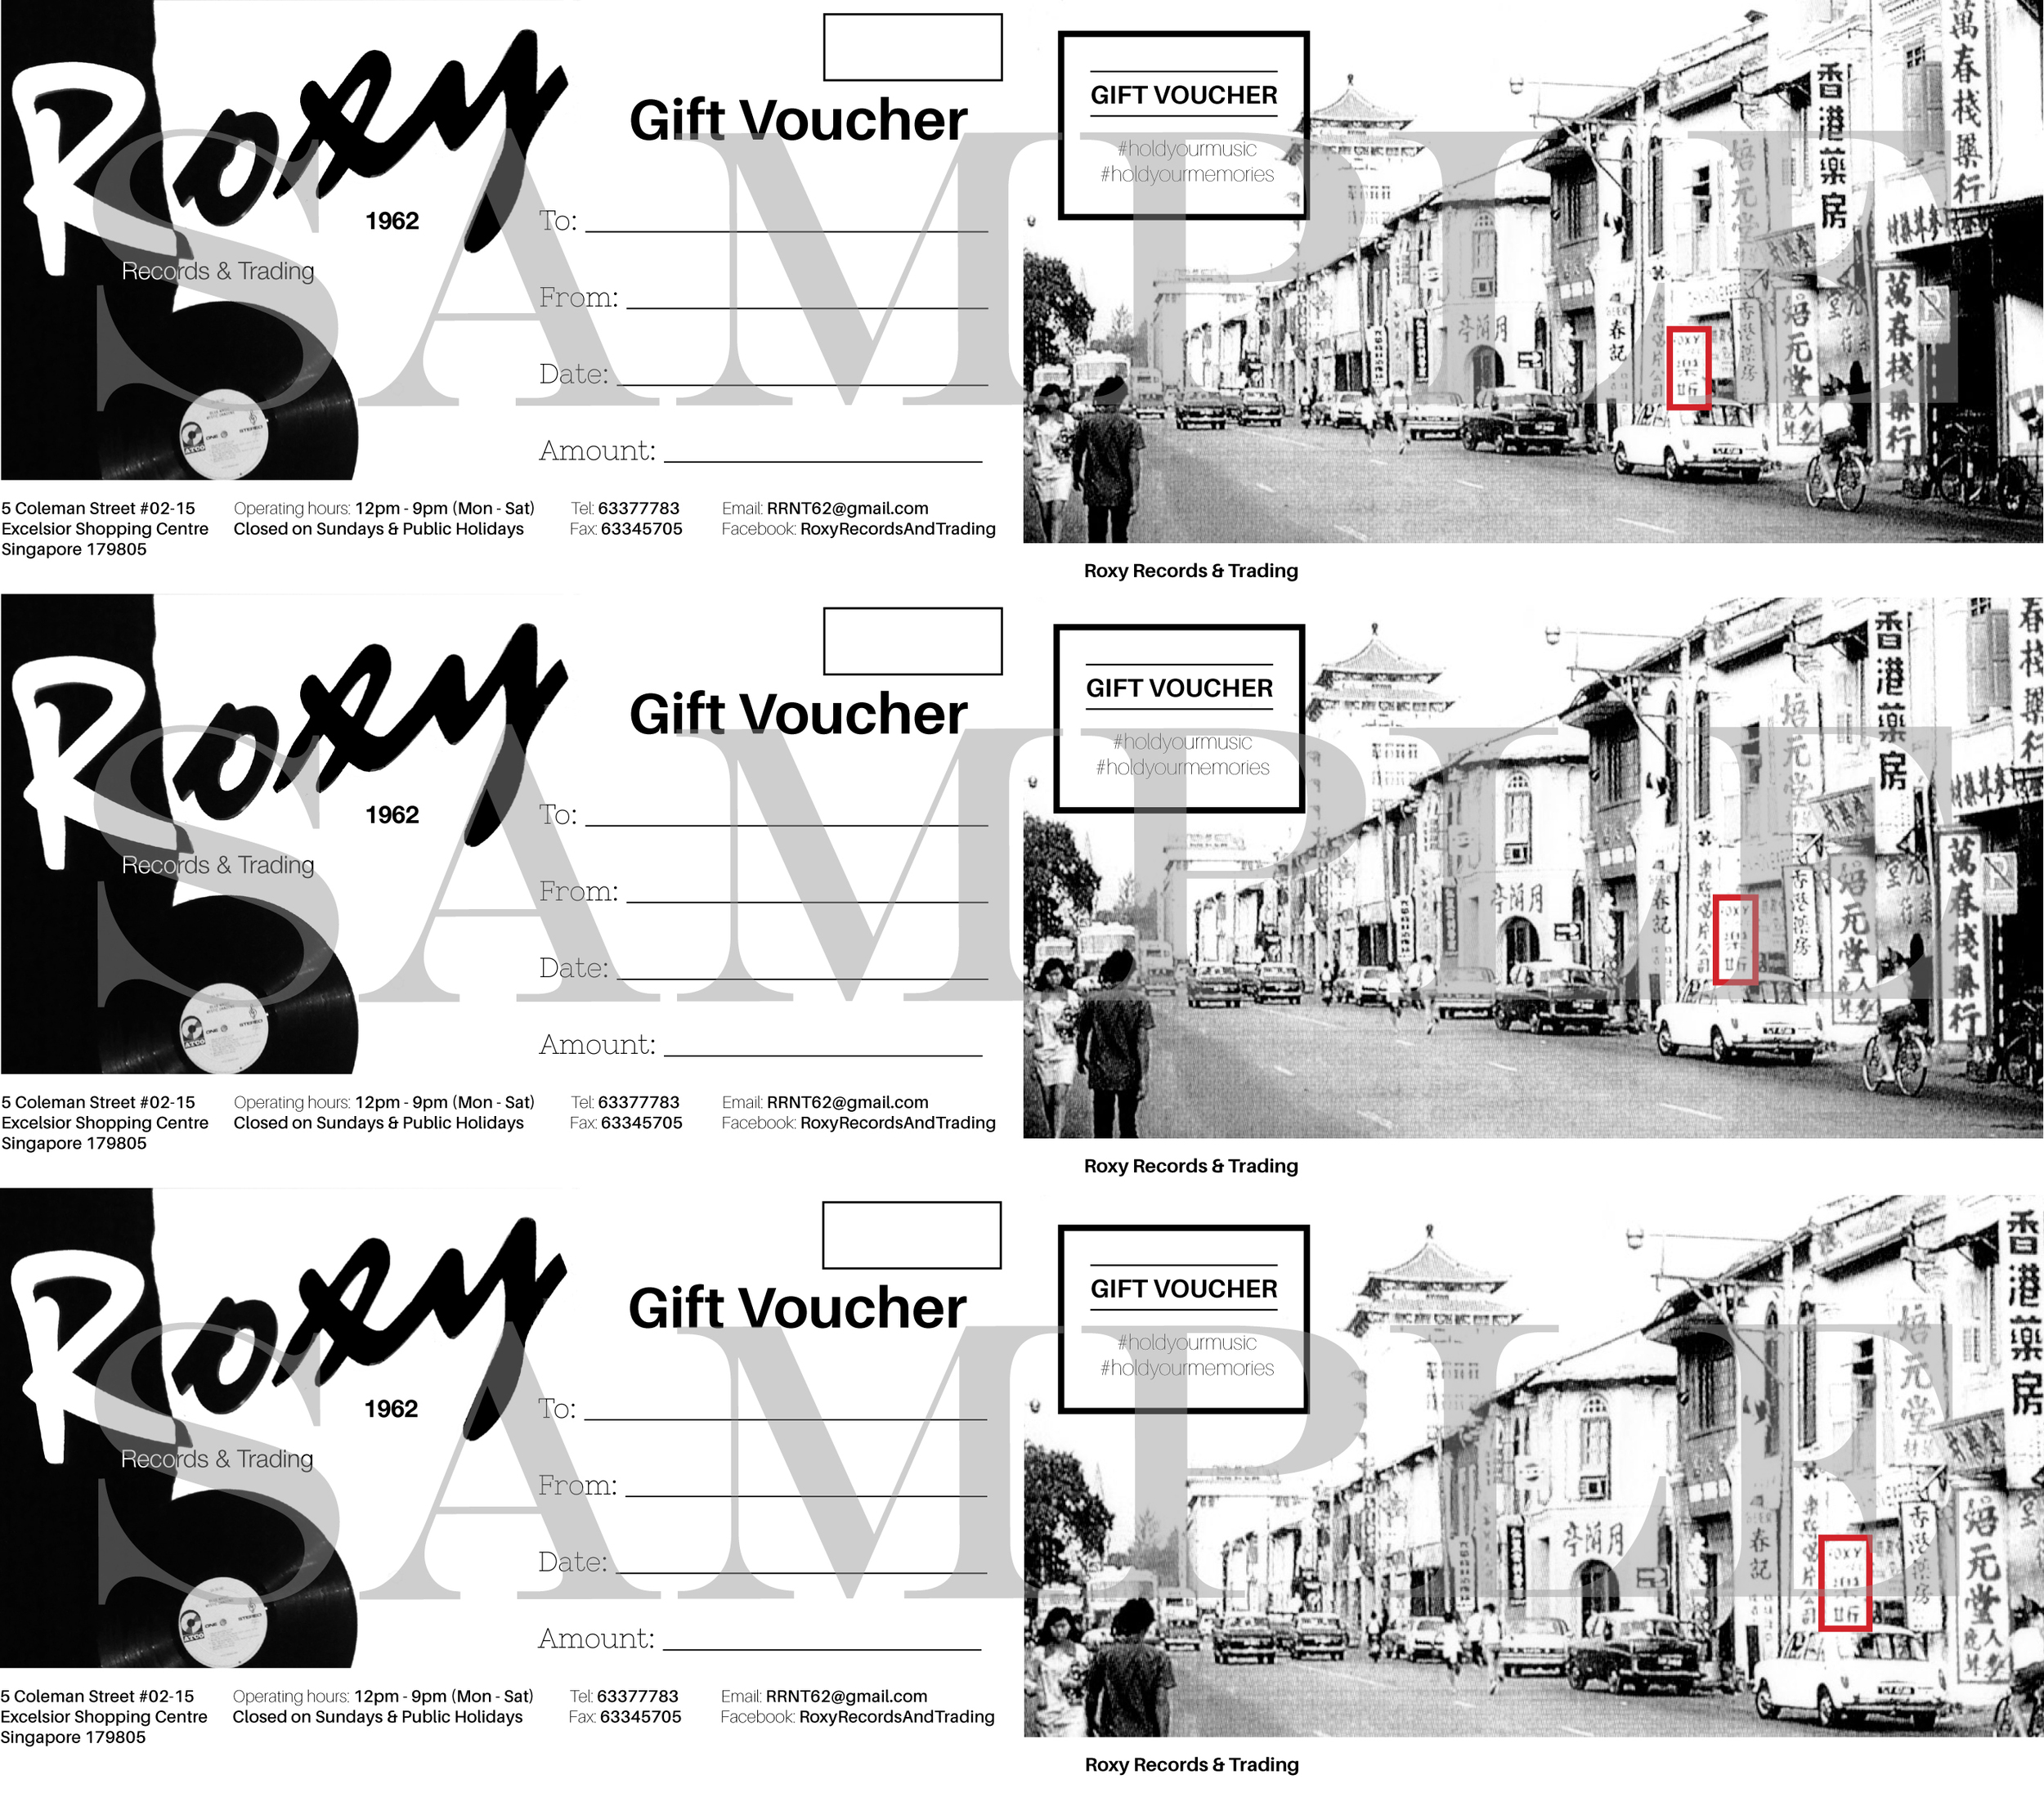 Roxy gift certificate design portfolio (sample).jpg